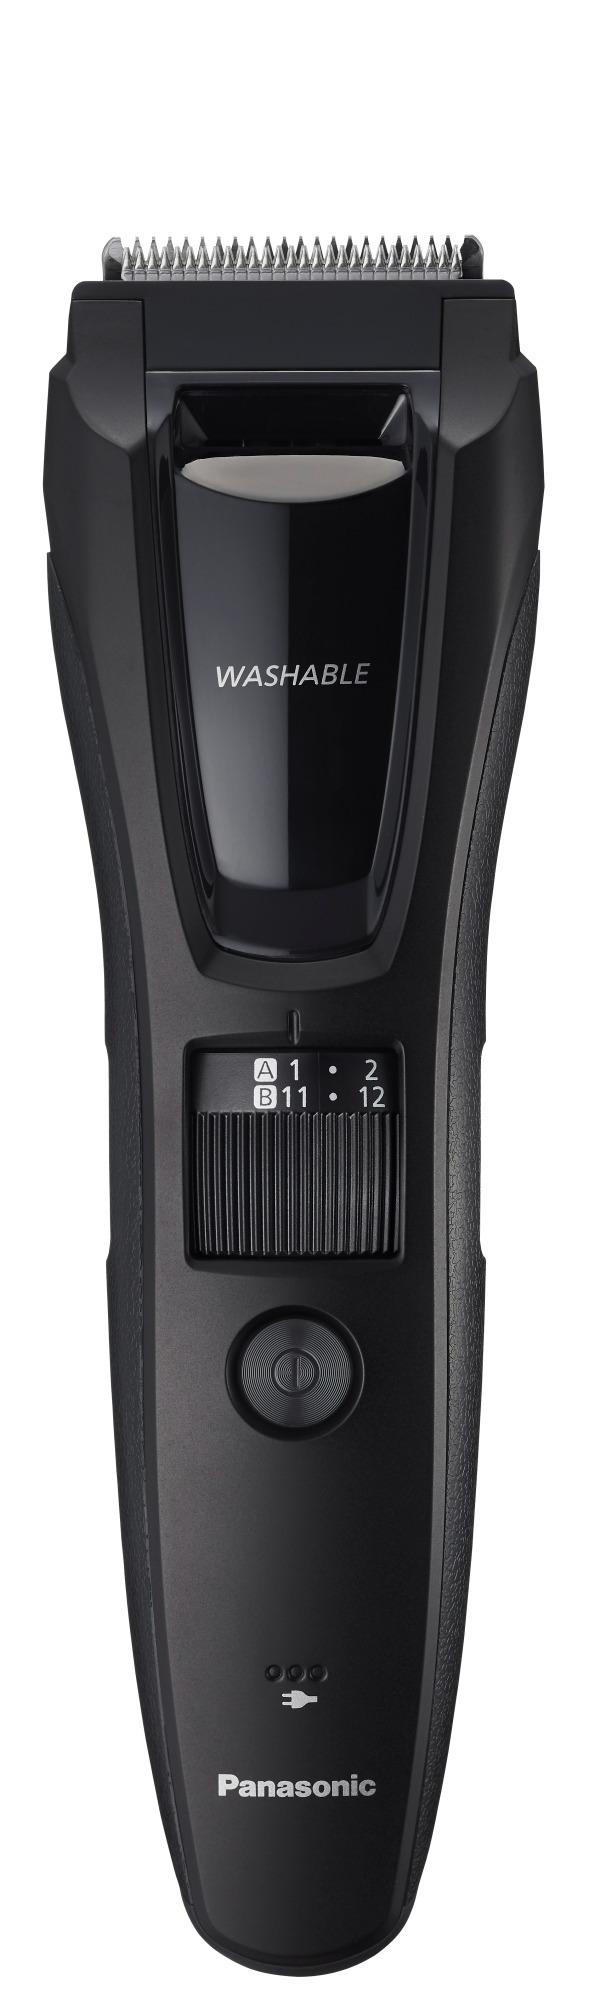 Korting Panasonic ER GB61 K503 baardtrimmer